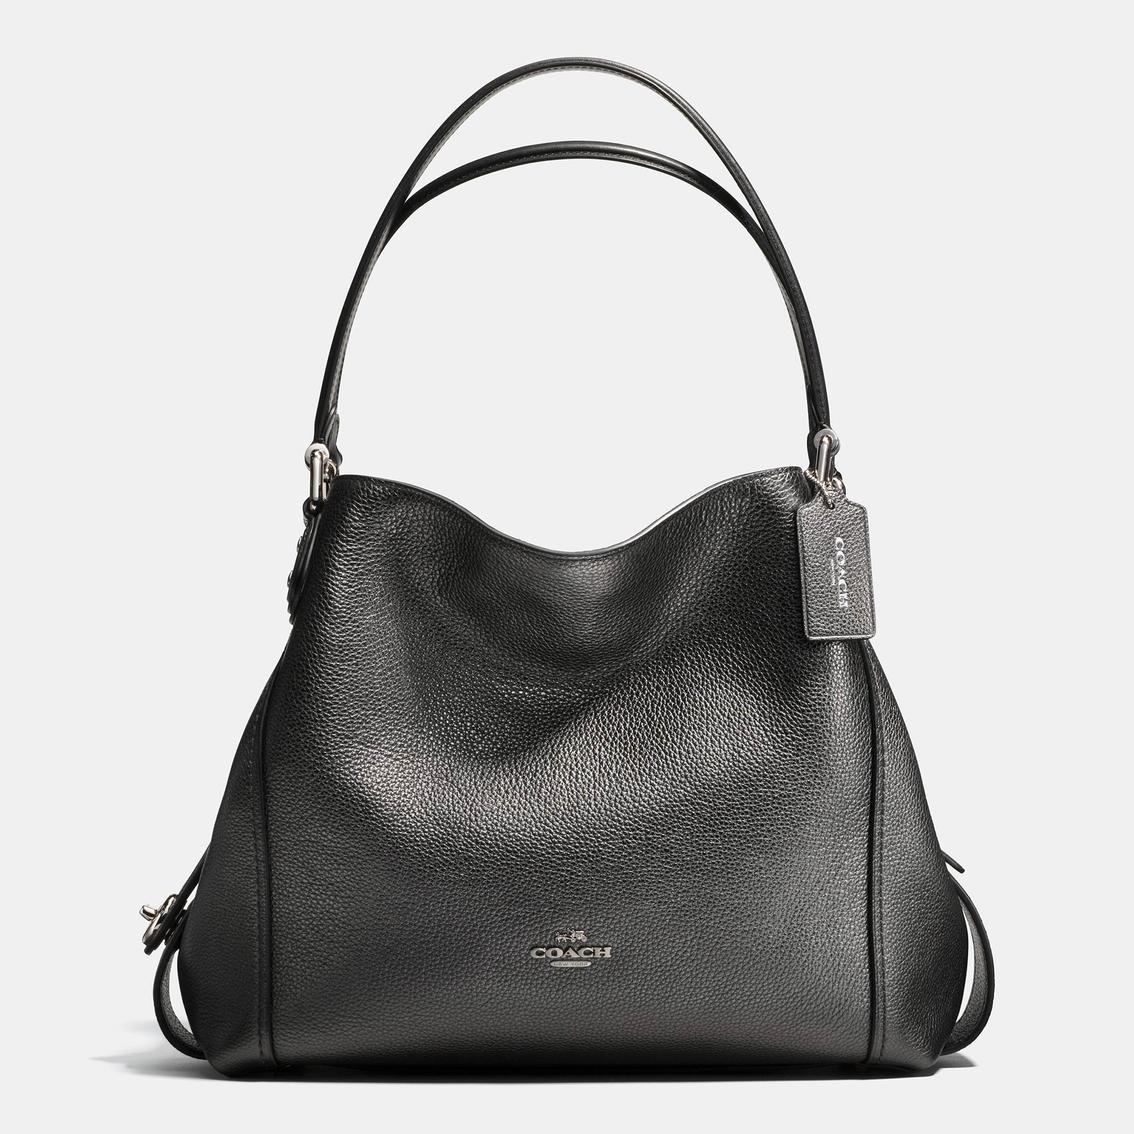 8fb1b1e10fa6 Coach Edie Shoulder Bag 31 In Metallic Leather